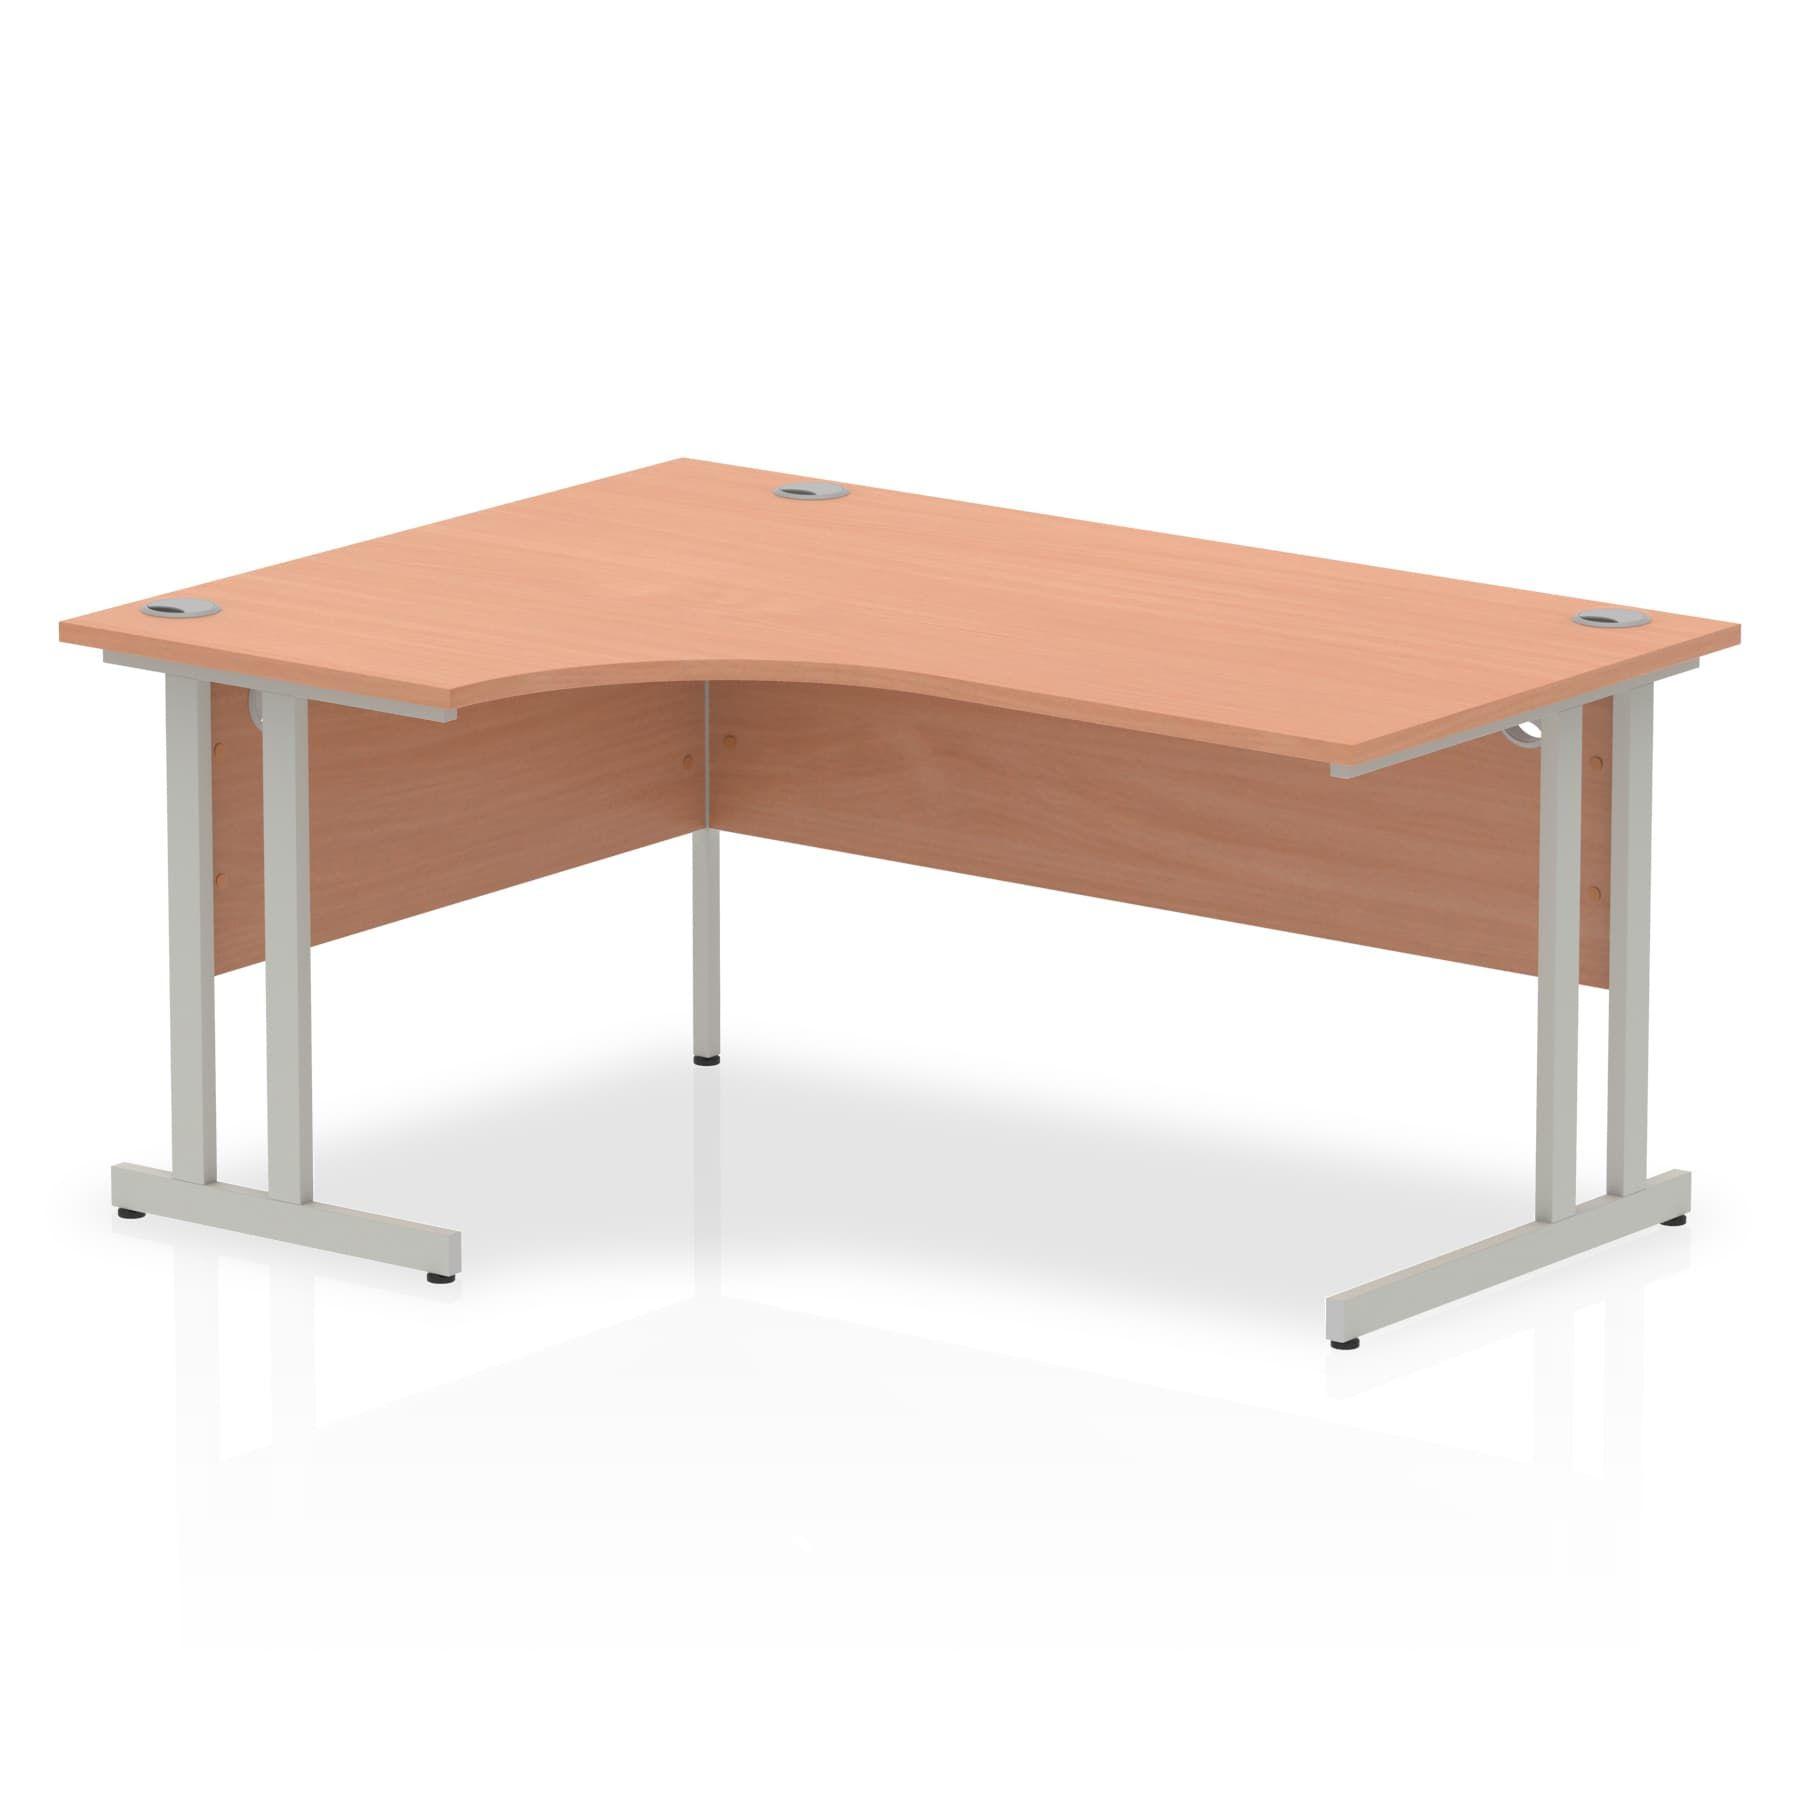 Impulse 1600 Left Hand Crescent Desk with Cantilever Leg